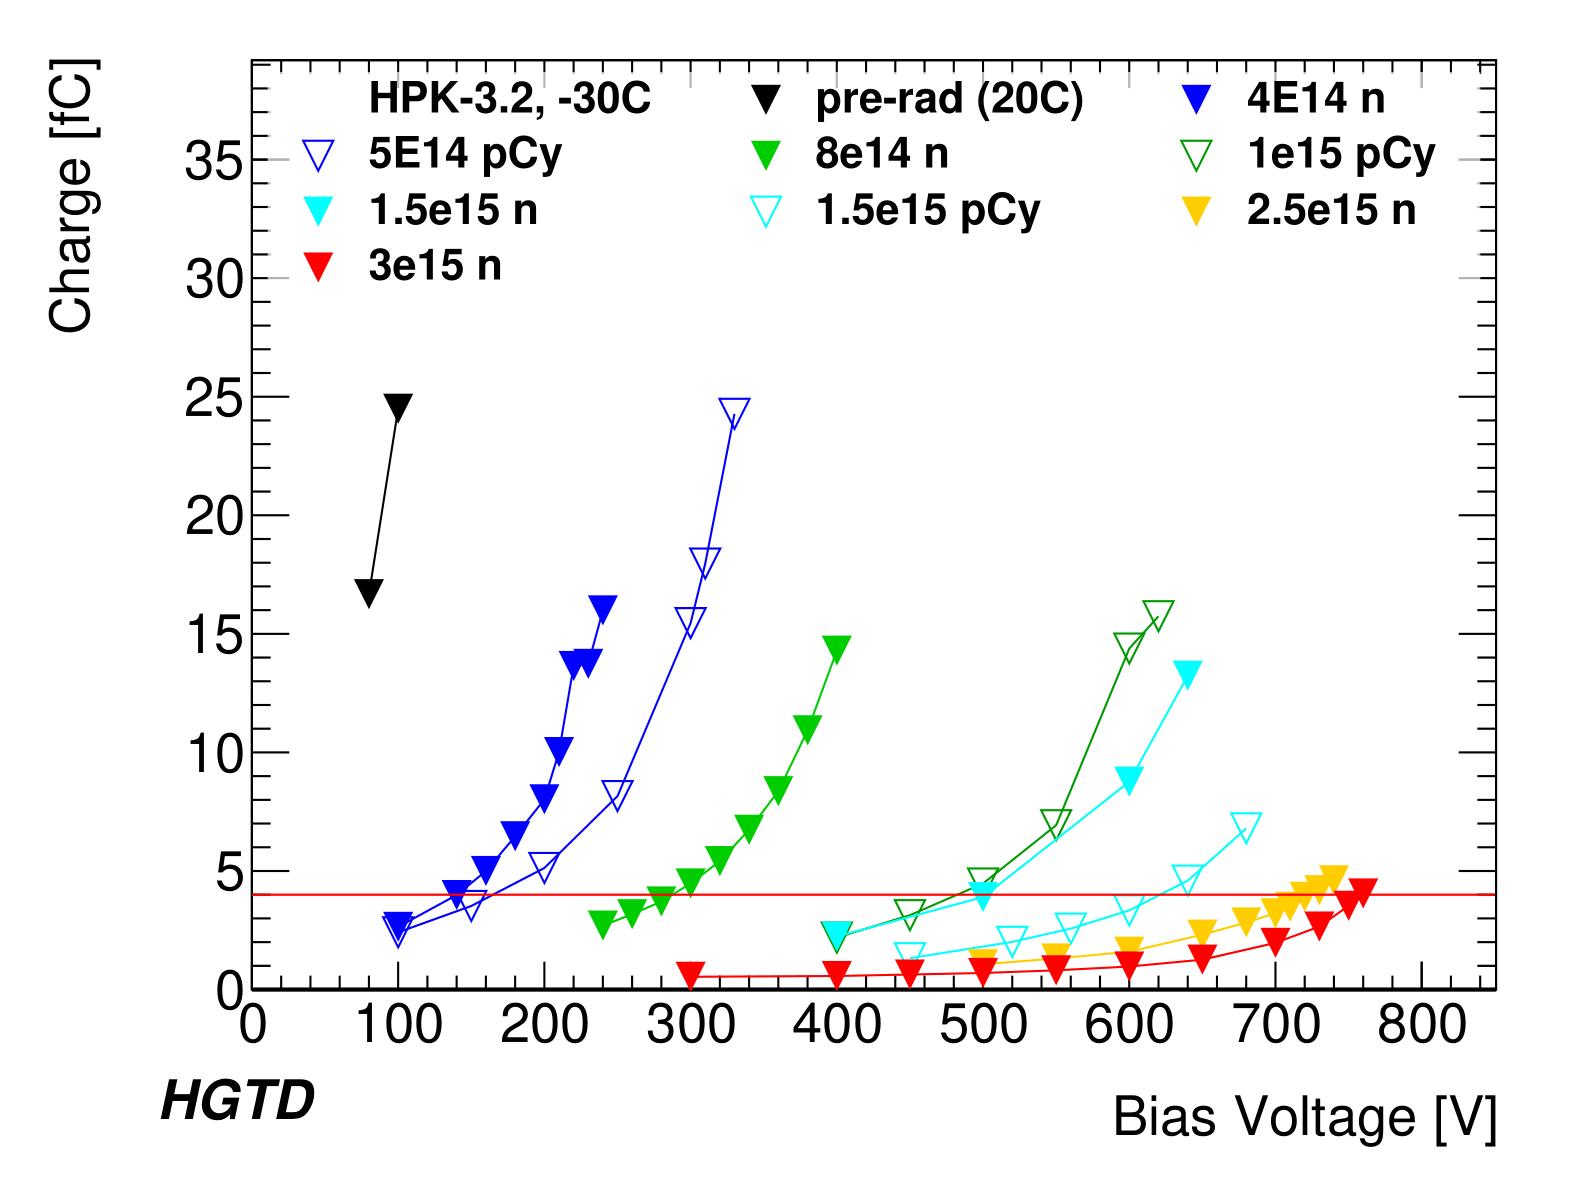 Plot_HPK32_bias_voltage_vs_charge_-1.png